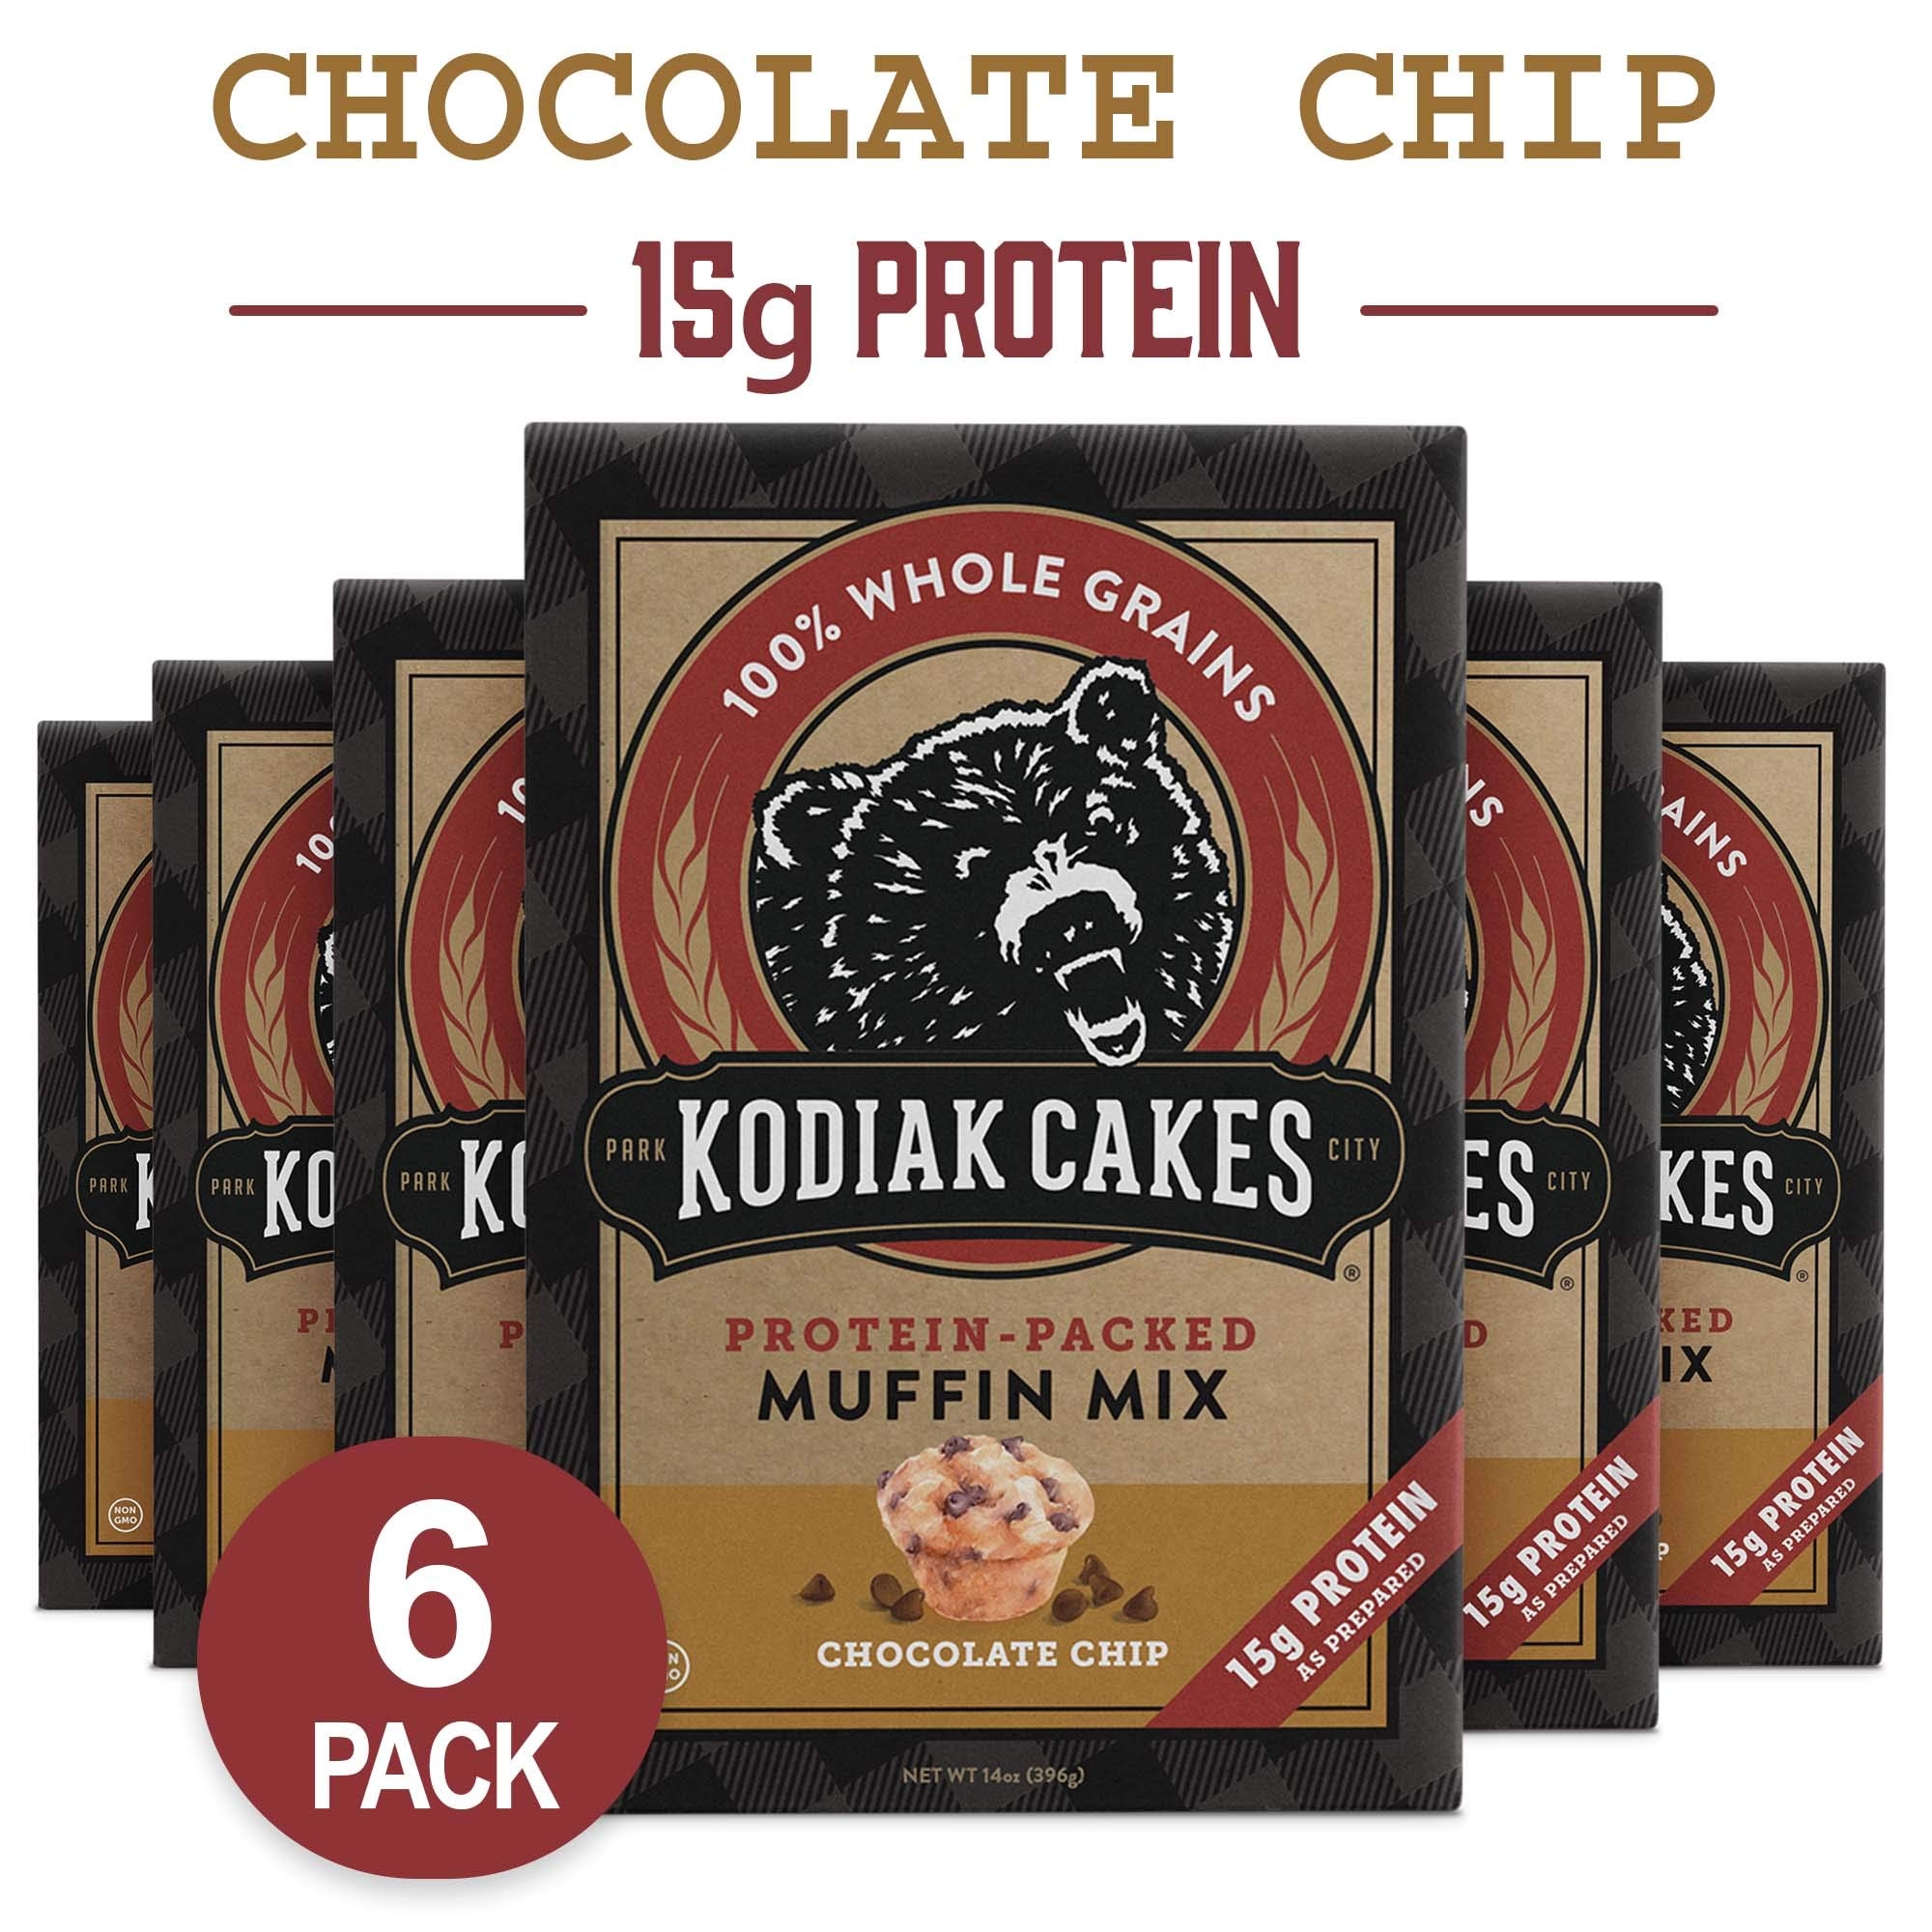 Kodiak Cakes Muffin Mix, Chocolate Chip (Pack of 6) by Kodiak Cakes